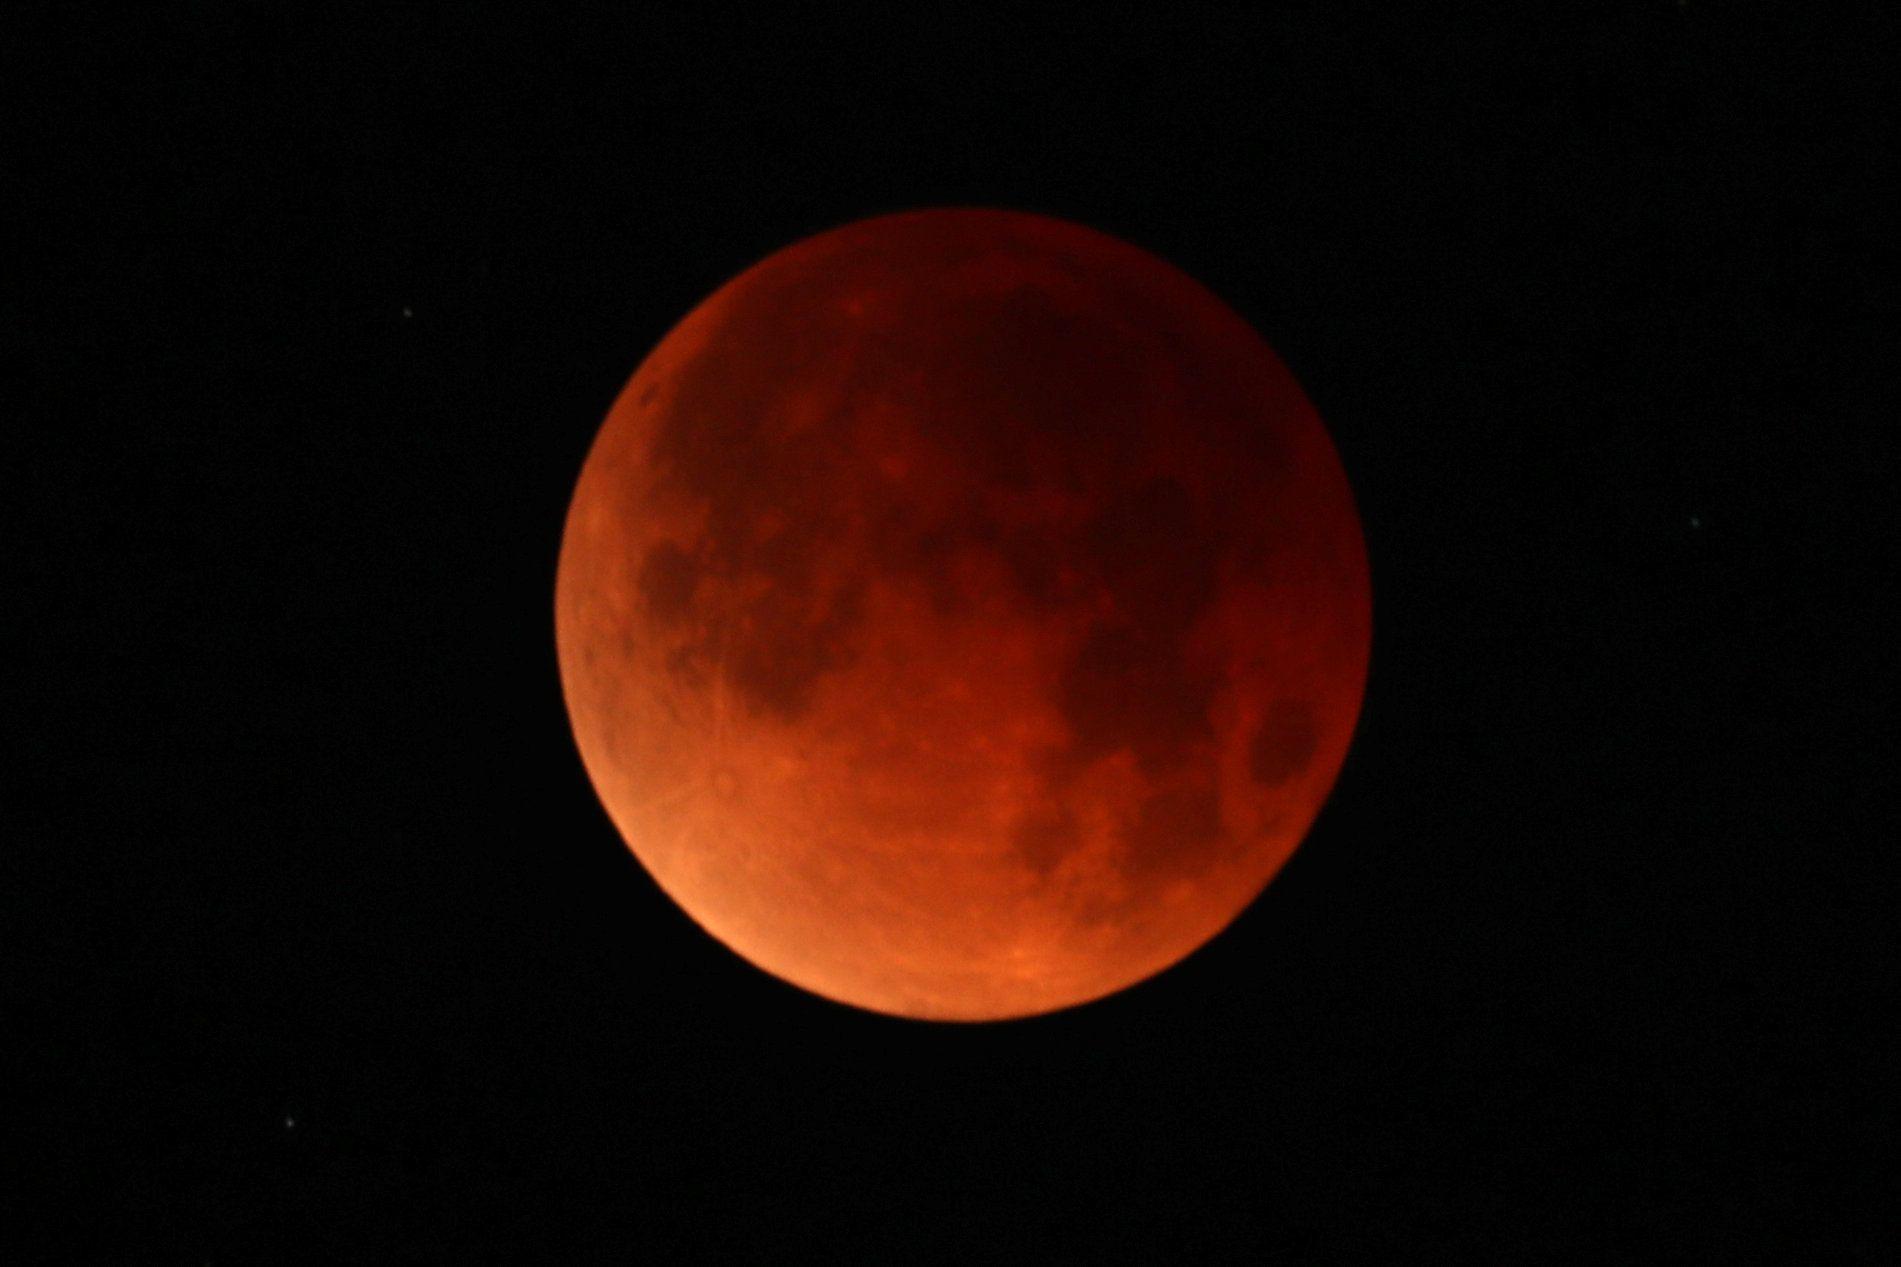 red moon blue sun 2018 - photo #3